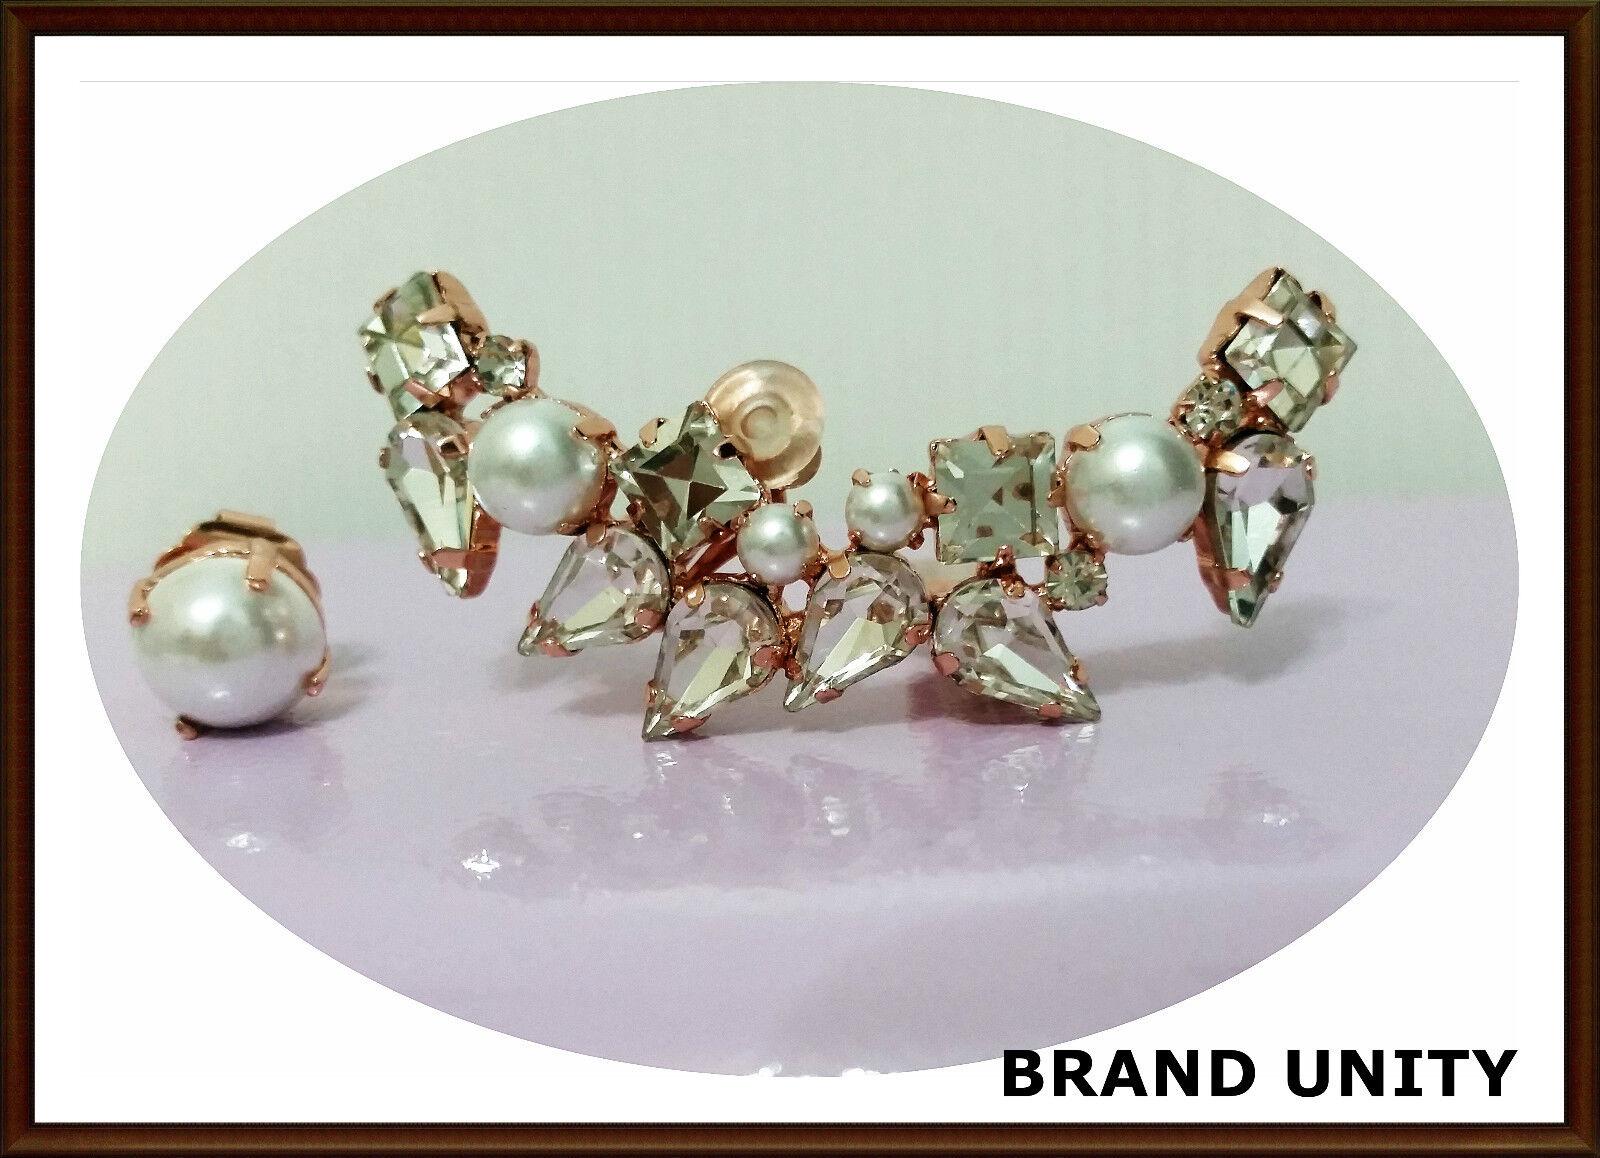 Mimco Varsity Crystal Ear Curf Earrings BNWT RRP  129 Pearl pinkgold